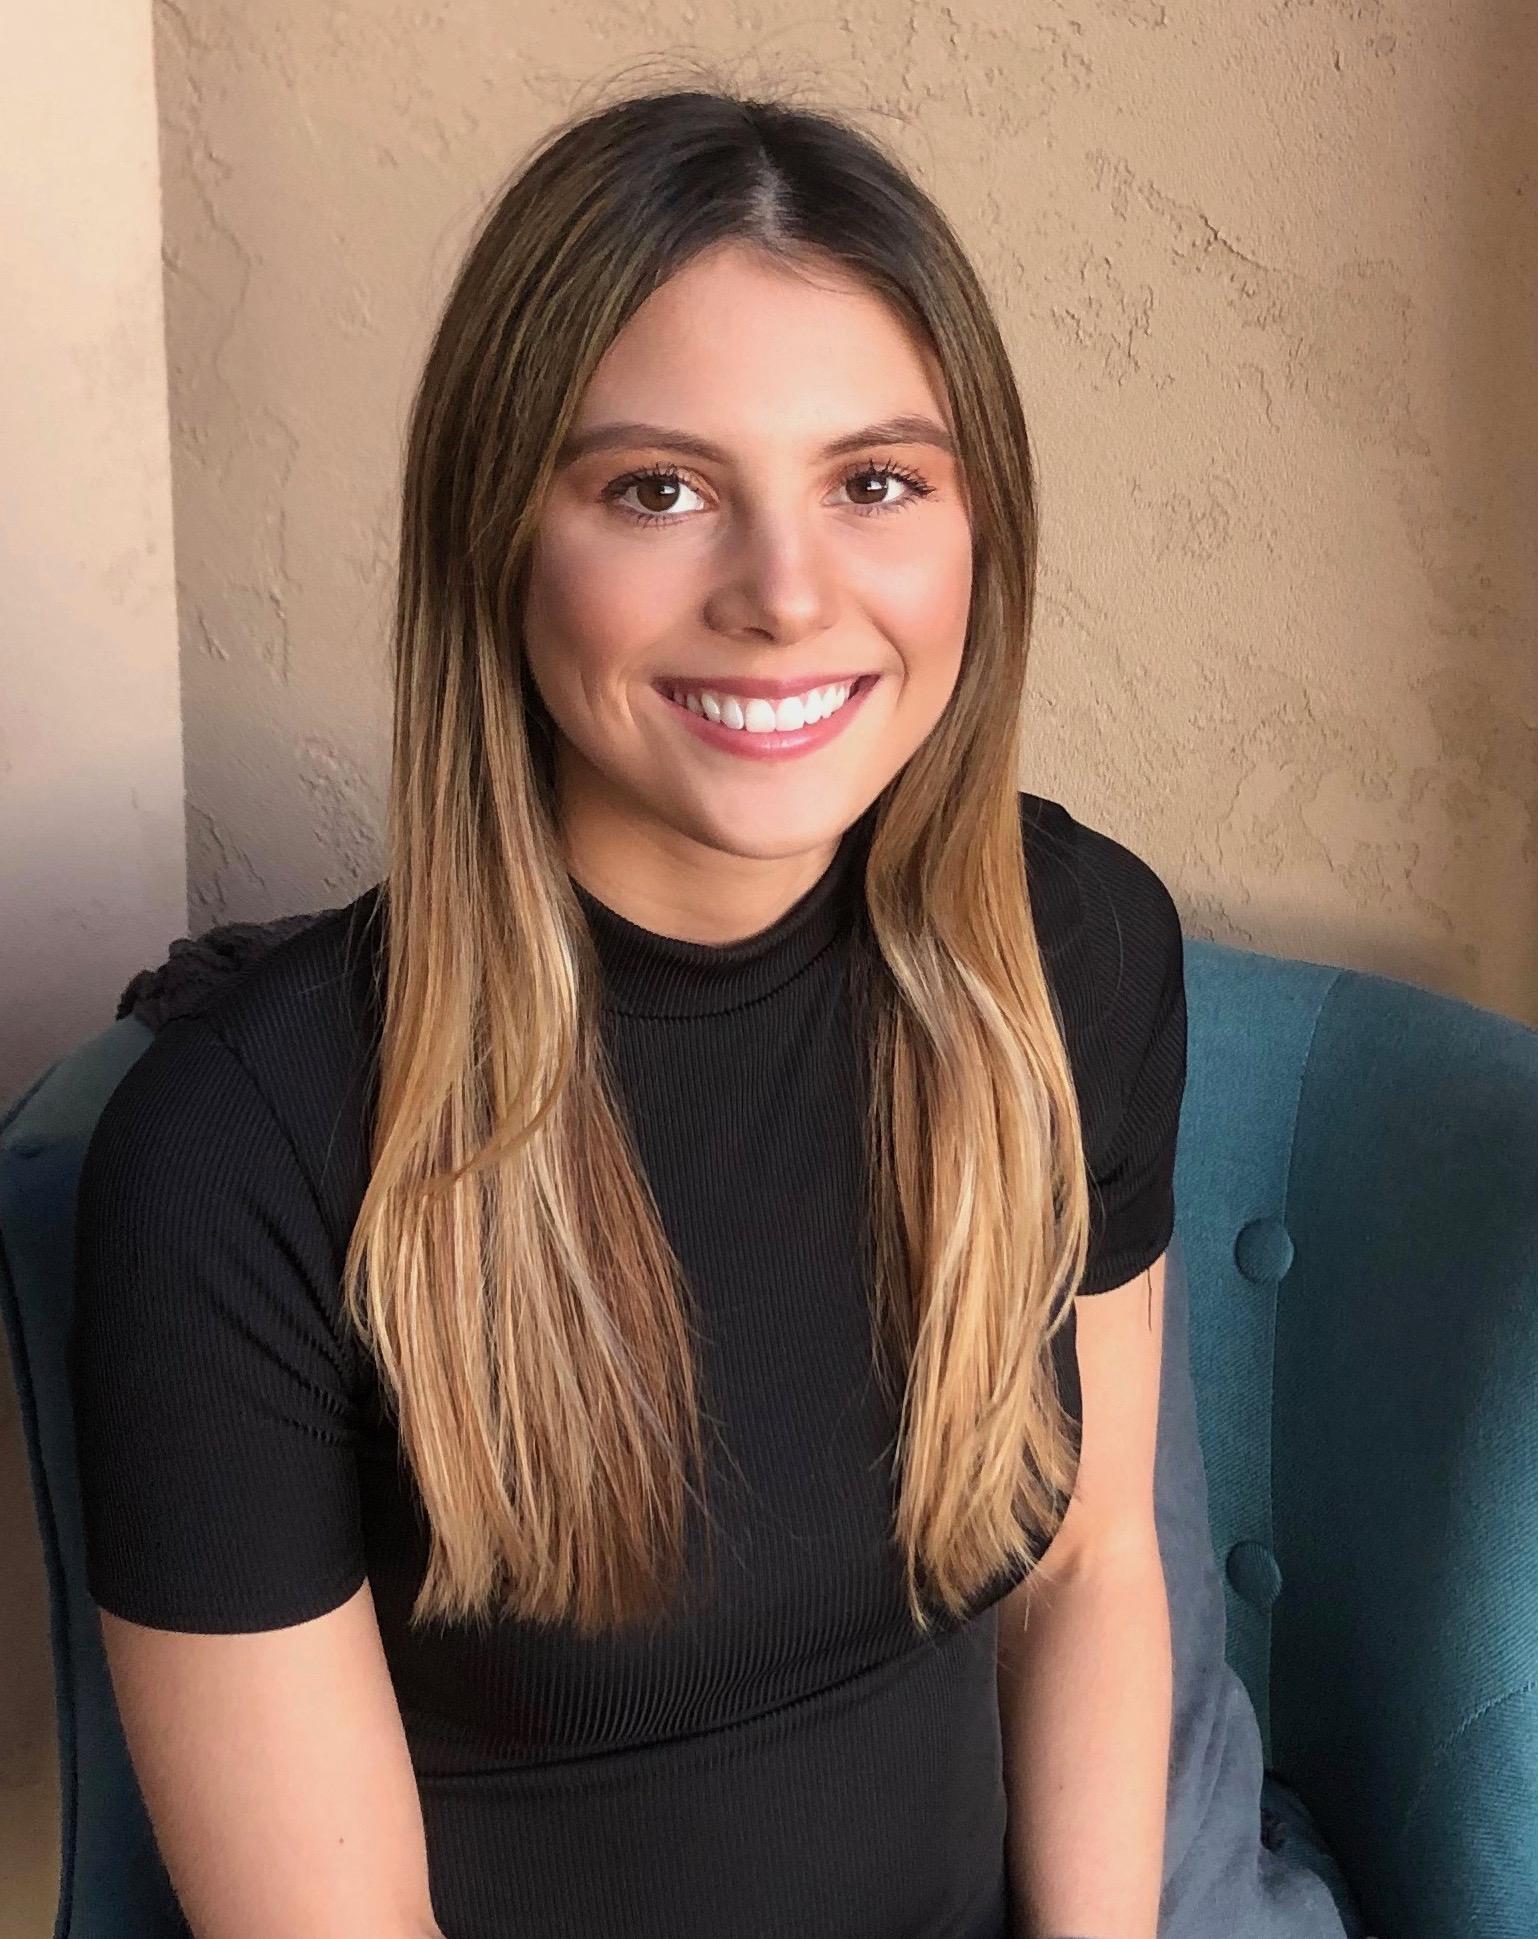 Prevention Fellow Sabrina DiGennaro